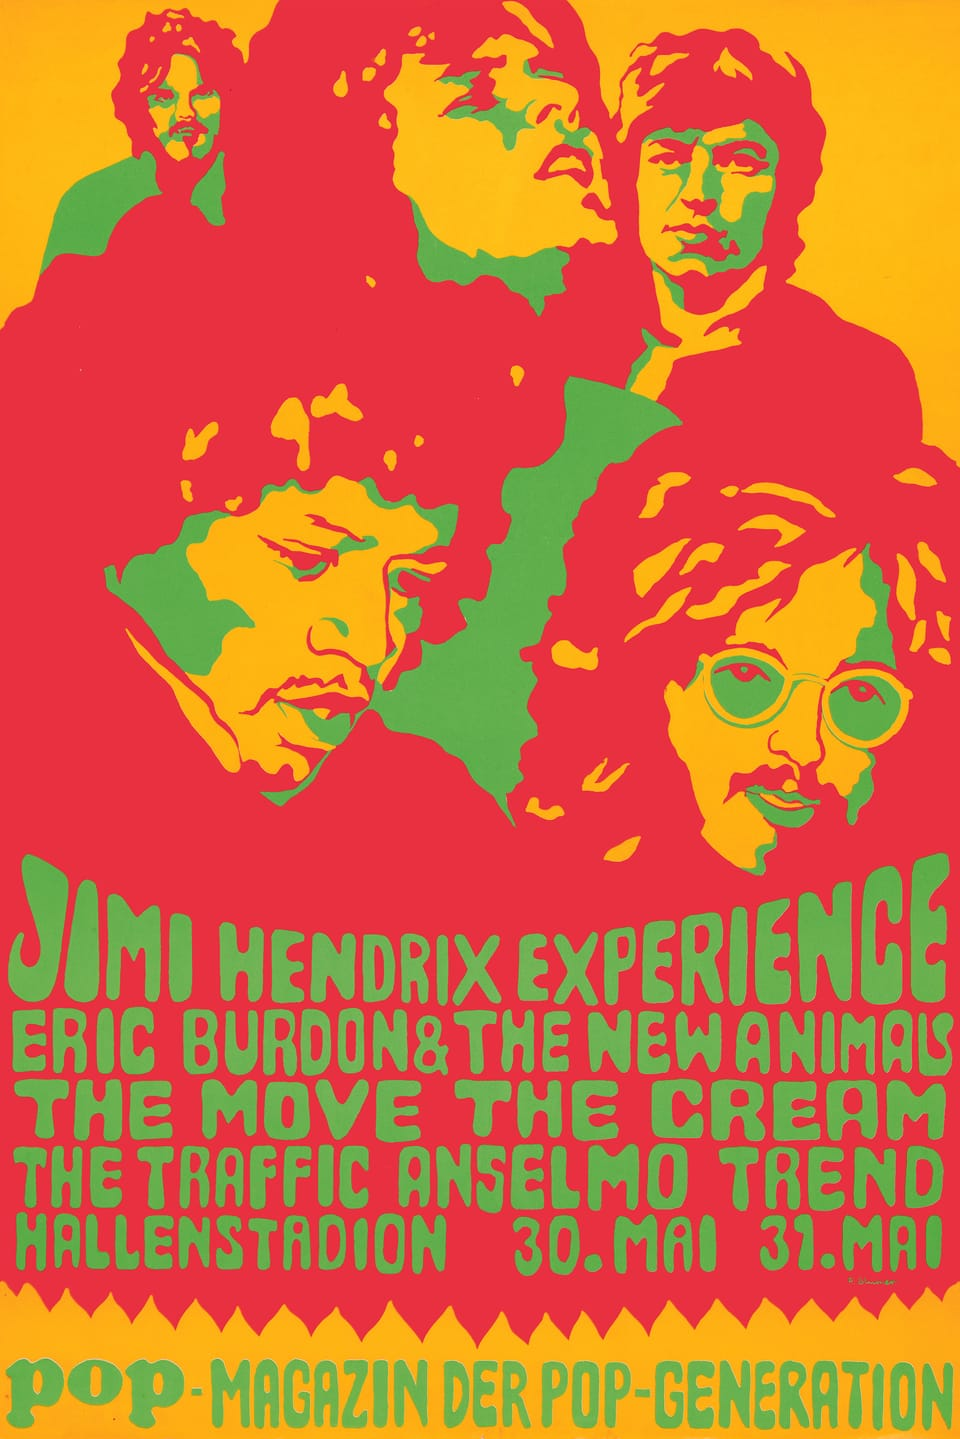 Konzertplakat von Jimi Hendrix